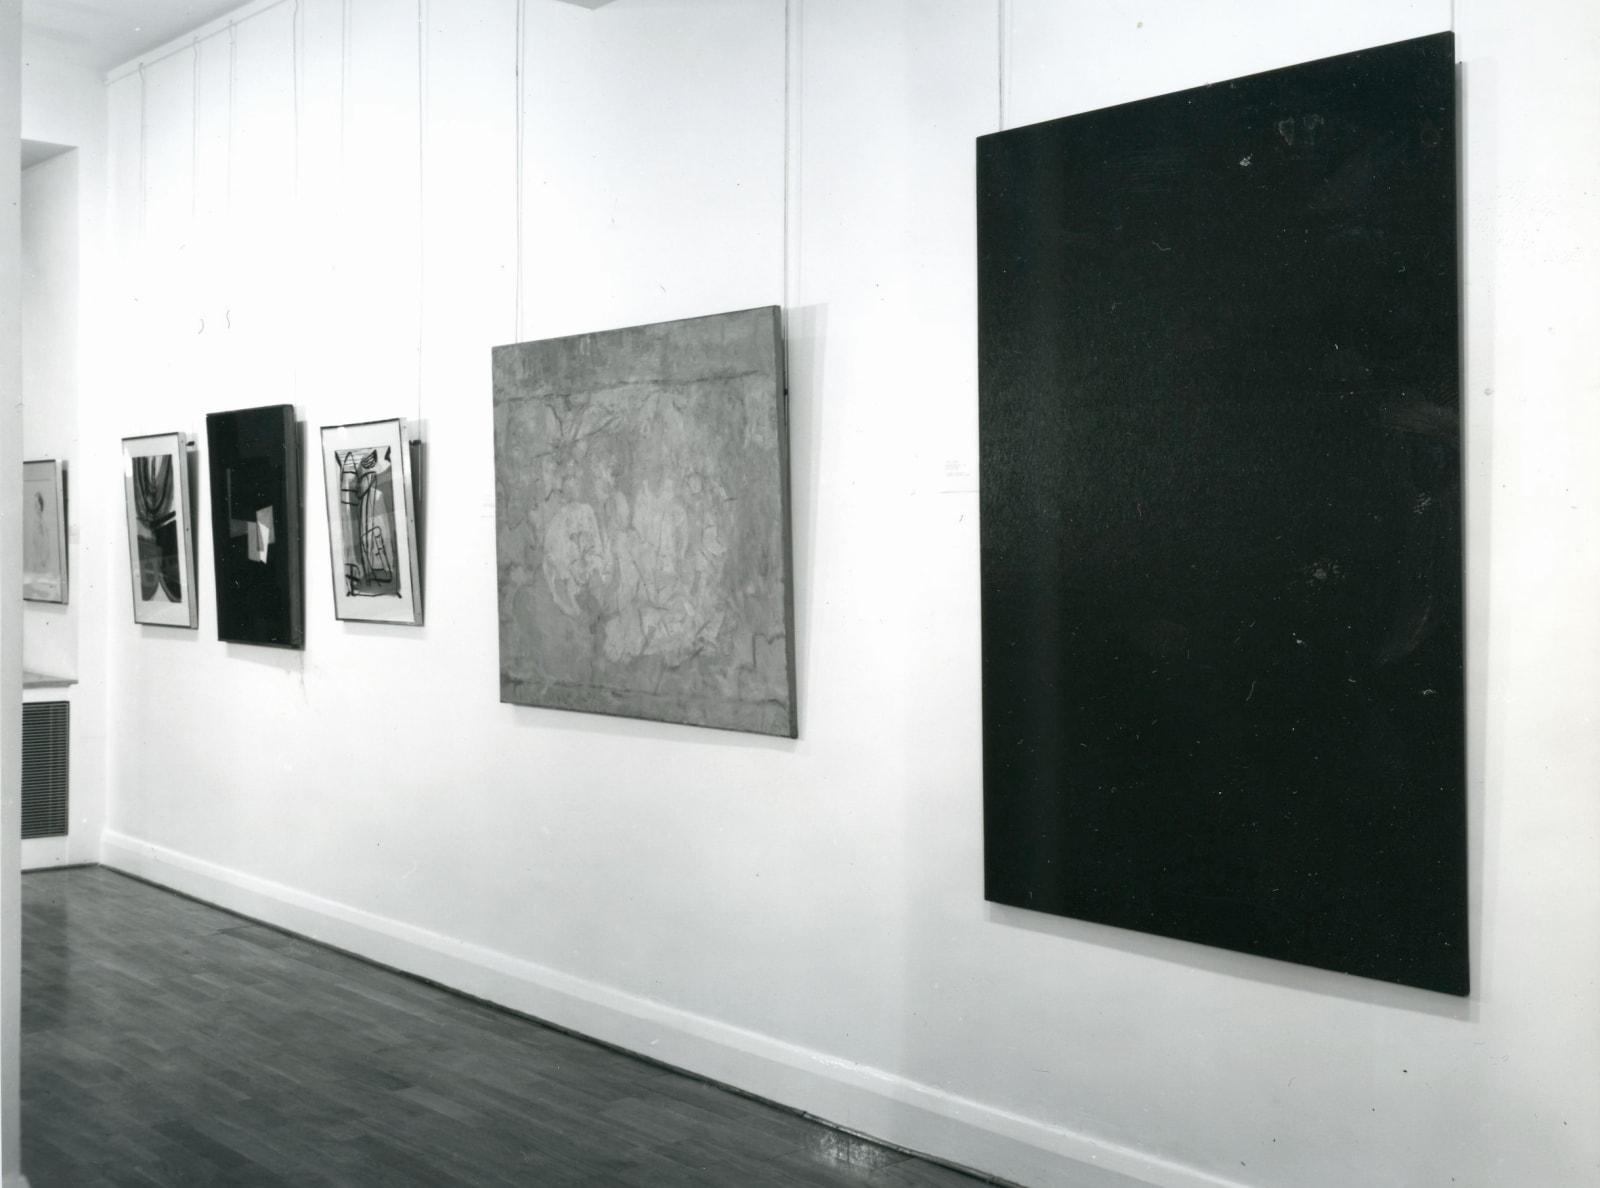 SOUTHAMPTON ART GALLERY Installation View